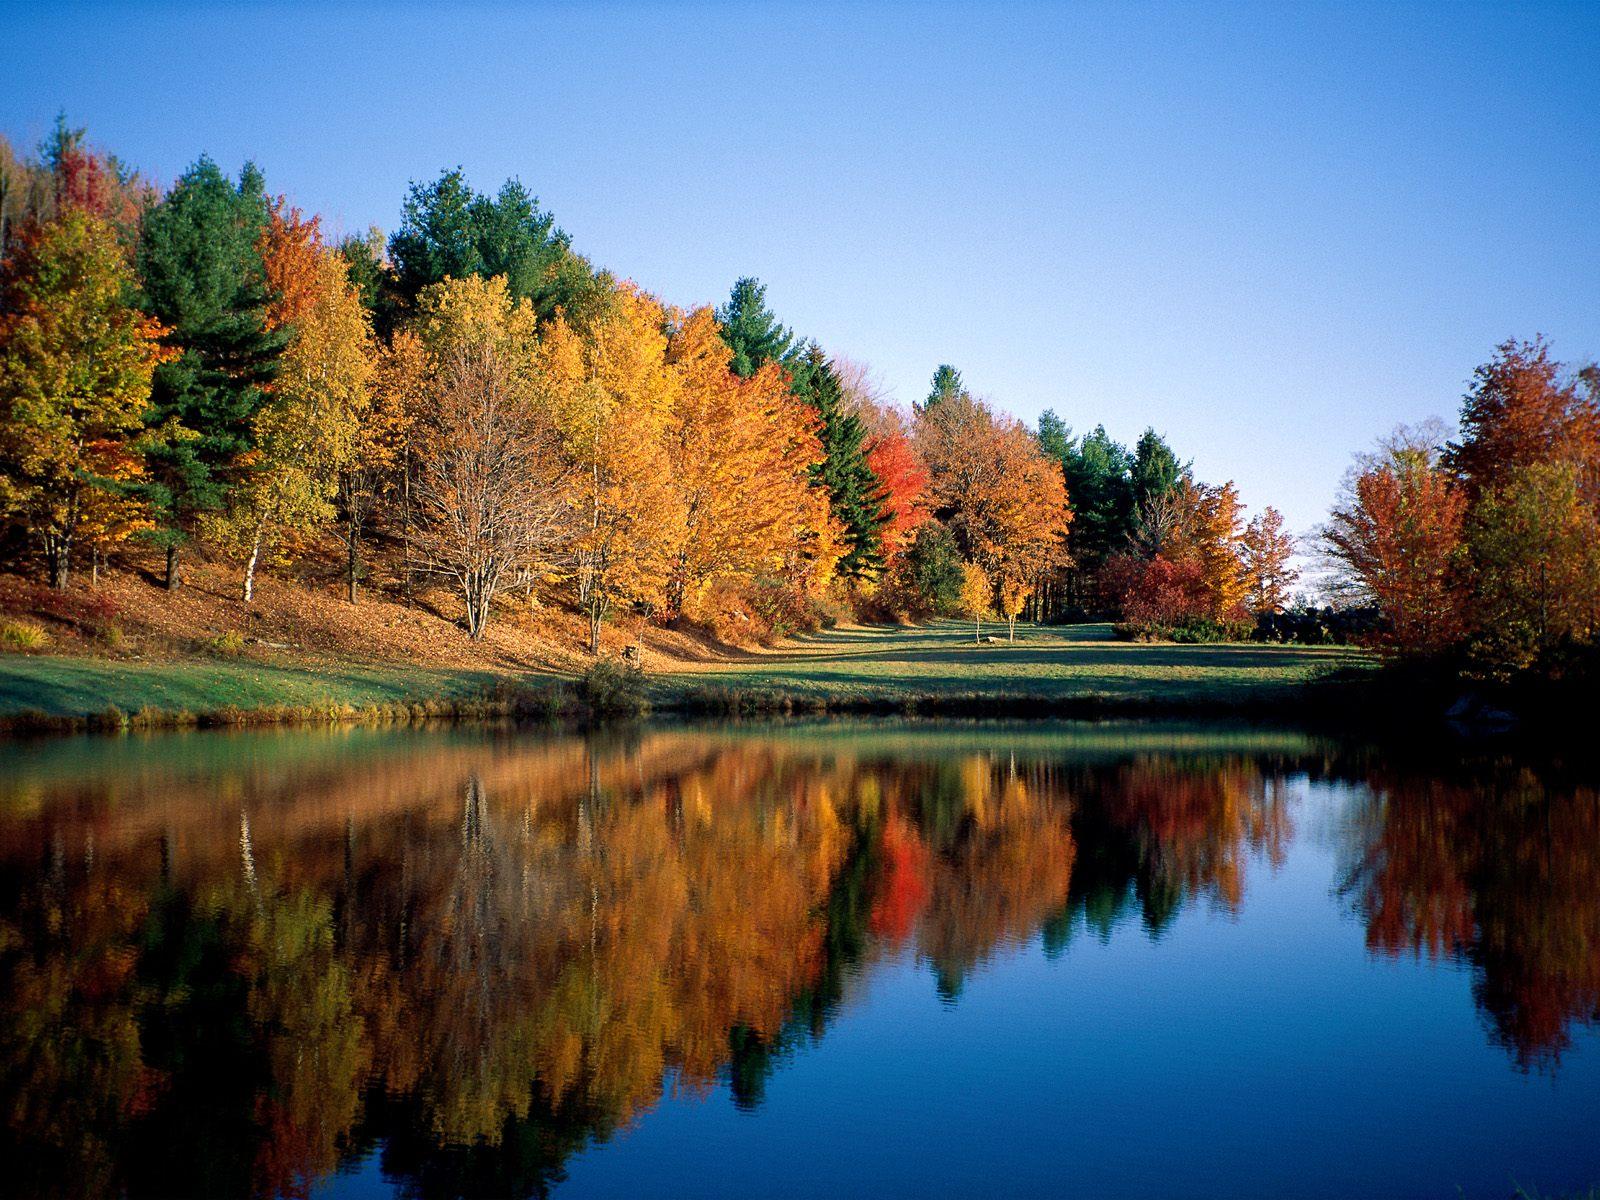 http://4.bp.blogspot.com/-qcSZRpFjuaY/ToSWpBXNNnI/AAAAAAAAAq0/0MSJQRySxBU/s1600/Vermont+Autumn.jpg